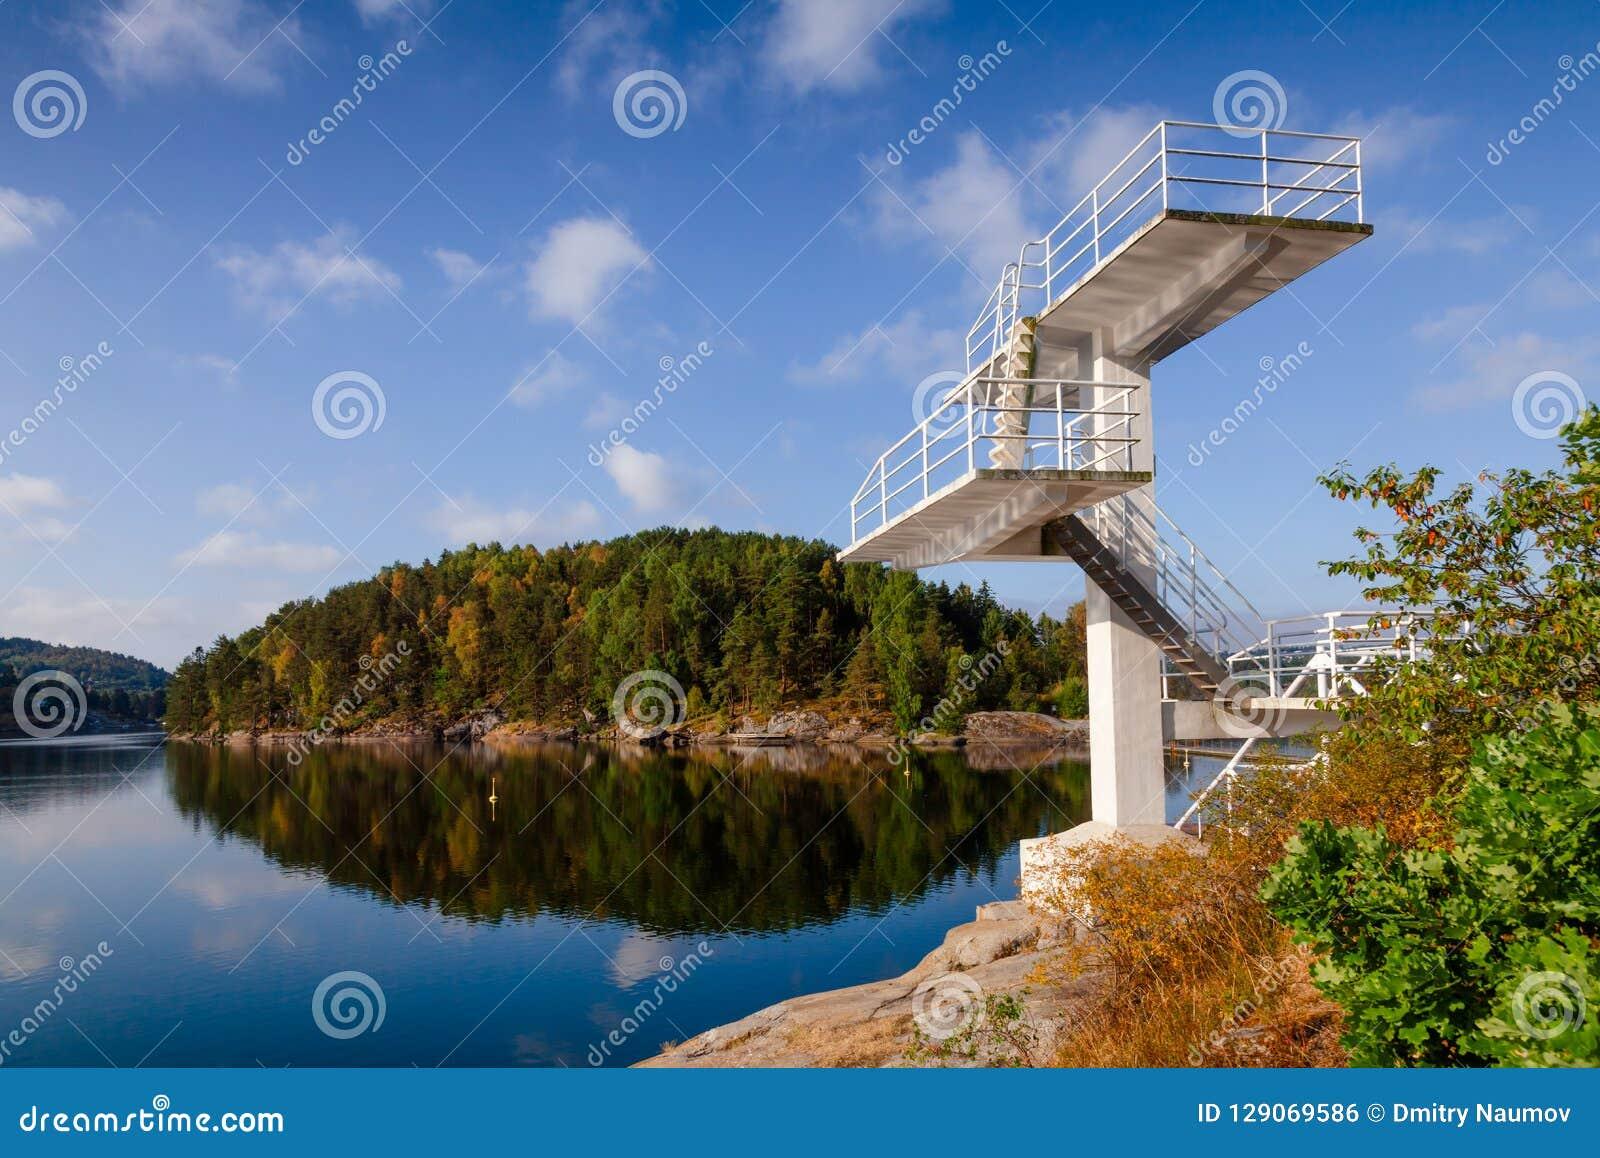 Diving tower in Olavsberget bathing place near Porsgrunn Telemark Norway Scandinavia